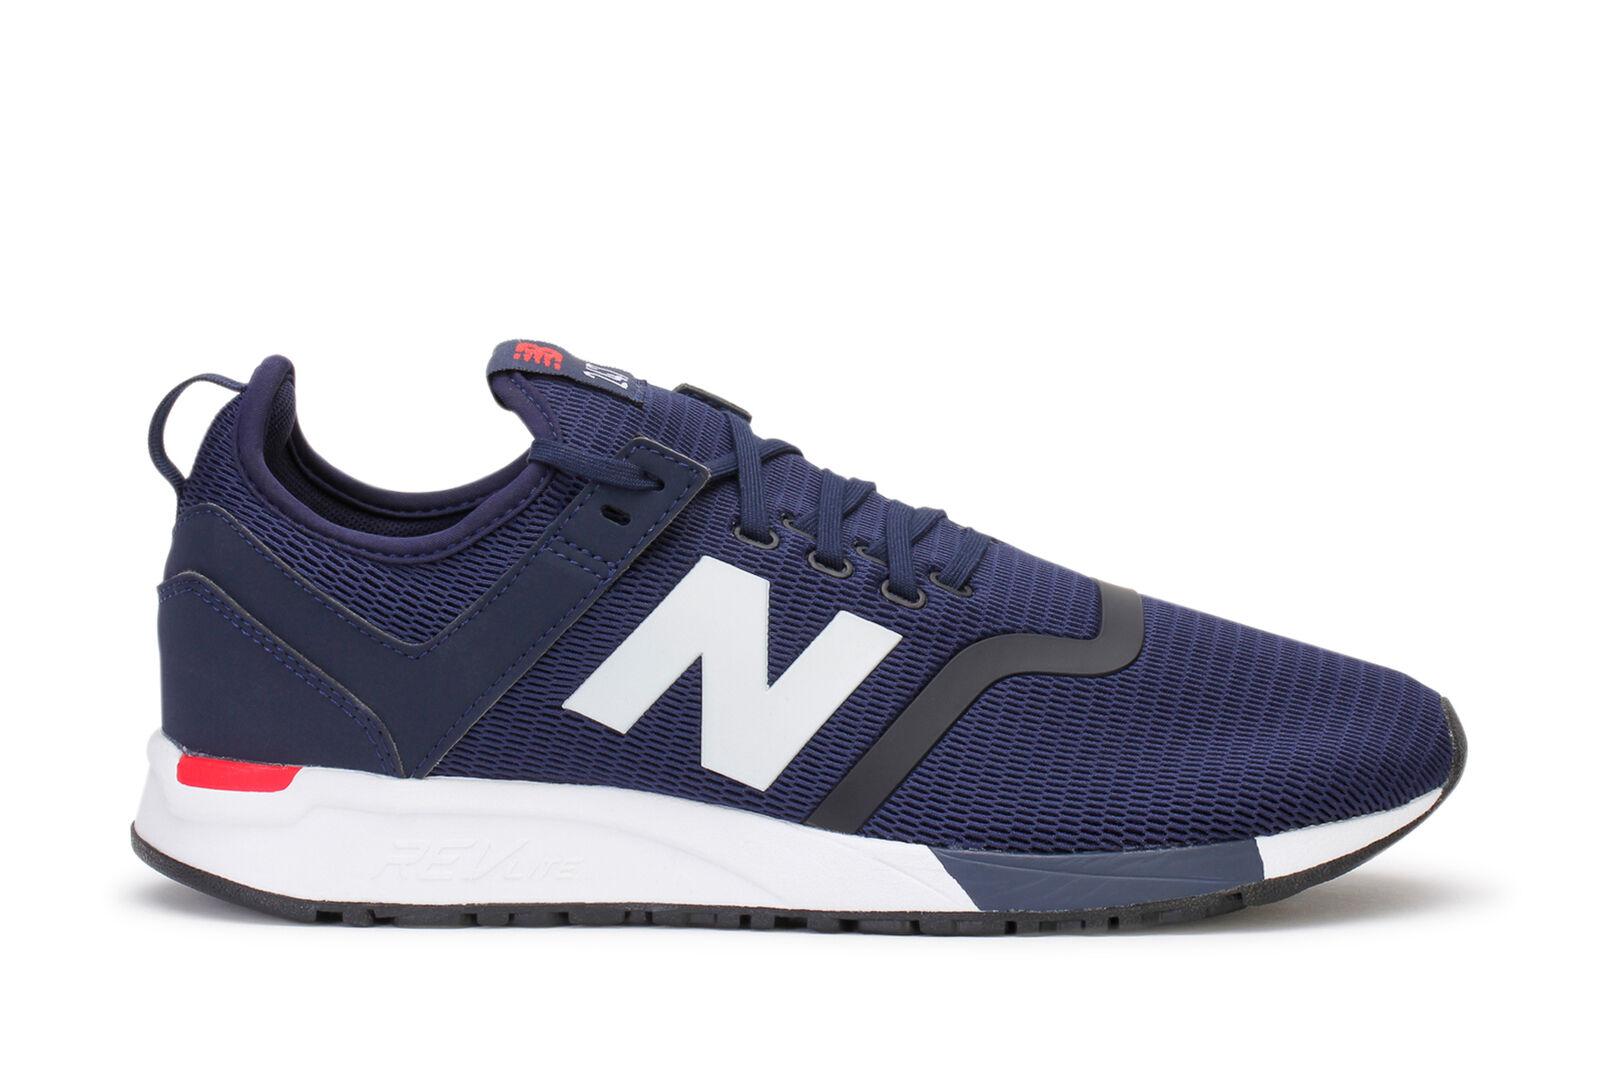 New Balance Men's Lifestyle Sneakers 247 Decon Pigment Cerise MRL247DH